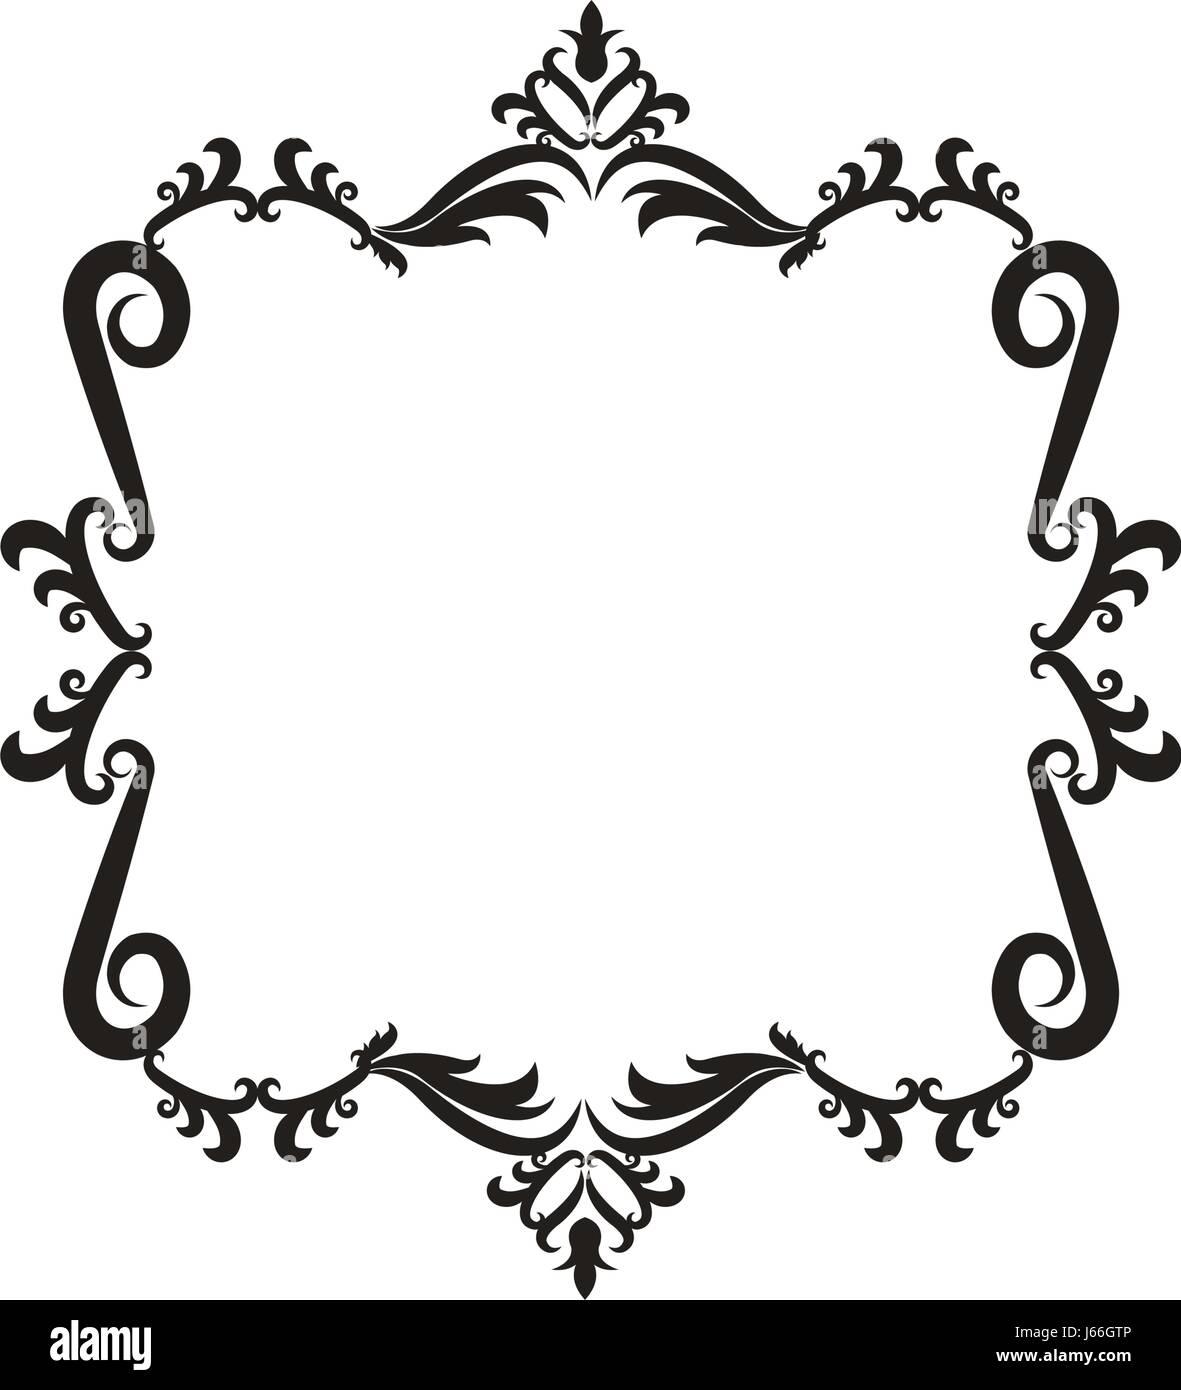 decorative frame floral border cute image Stock Vector Art ...